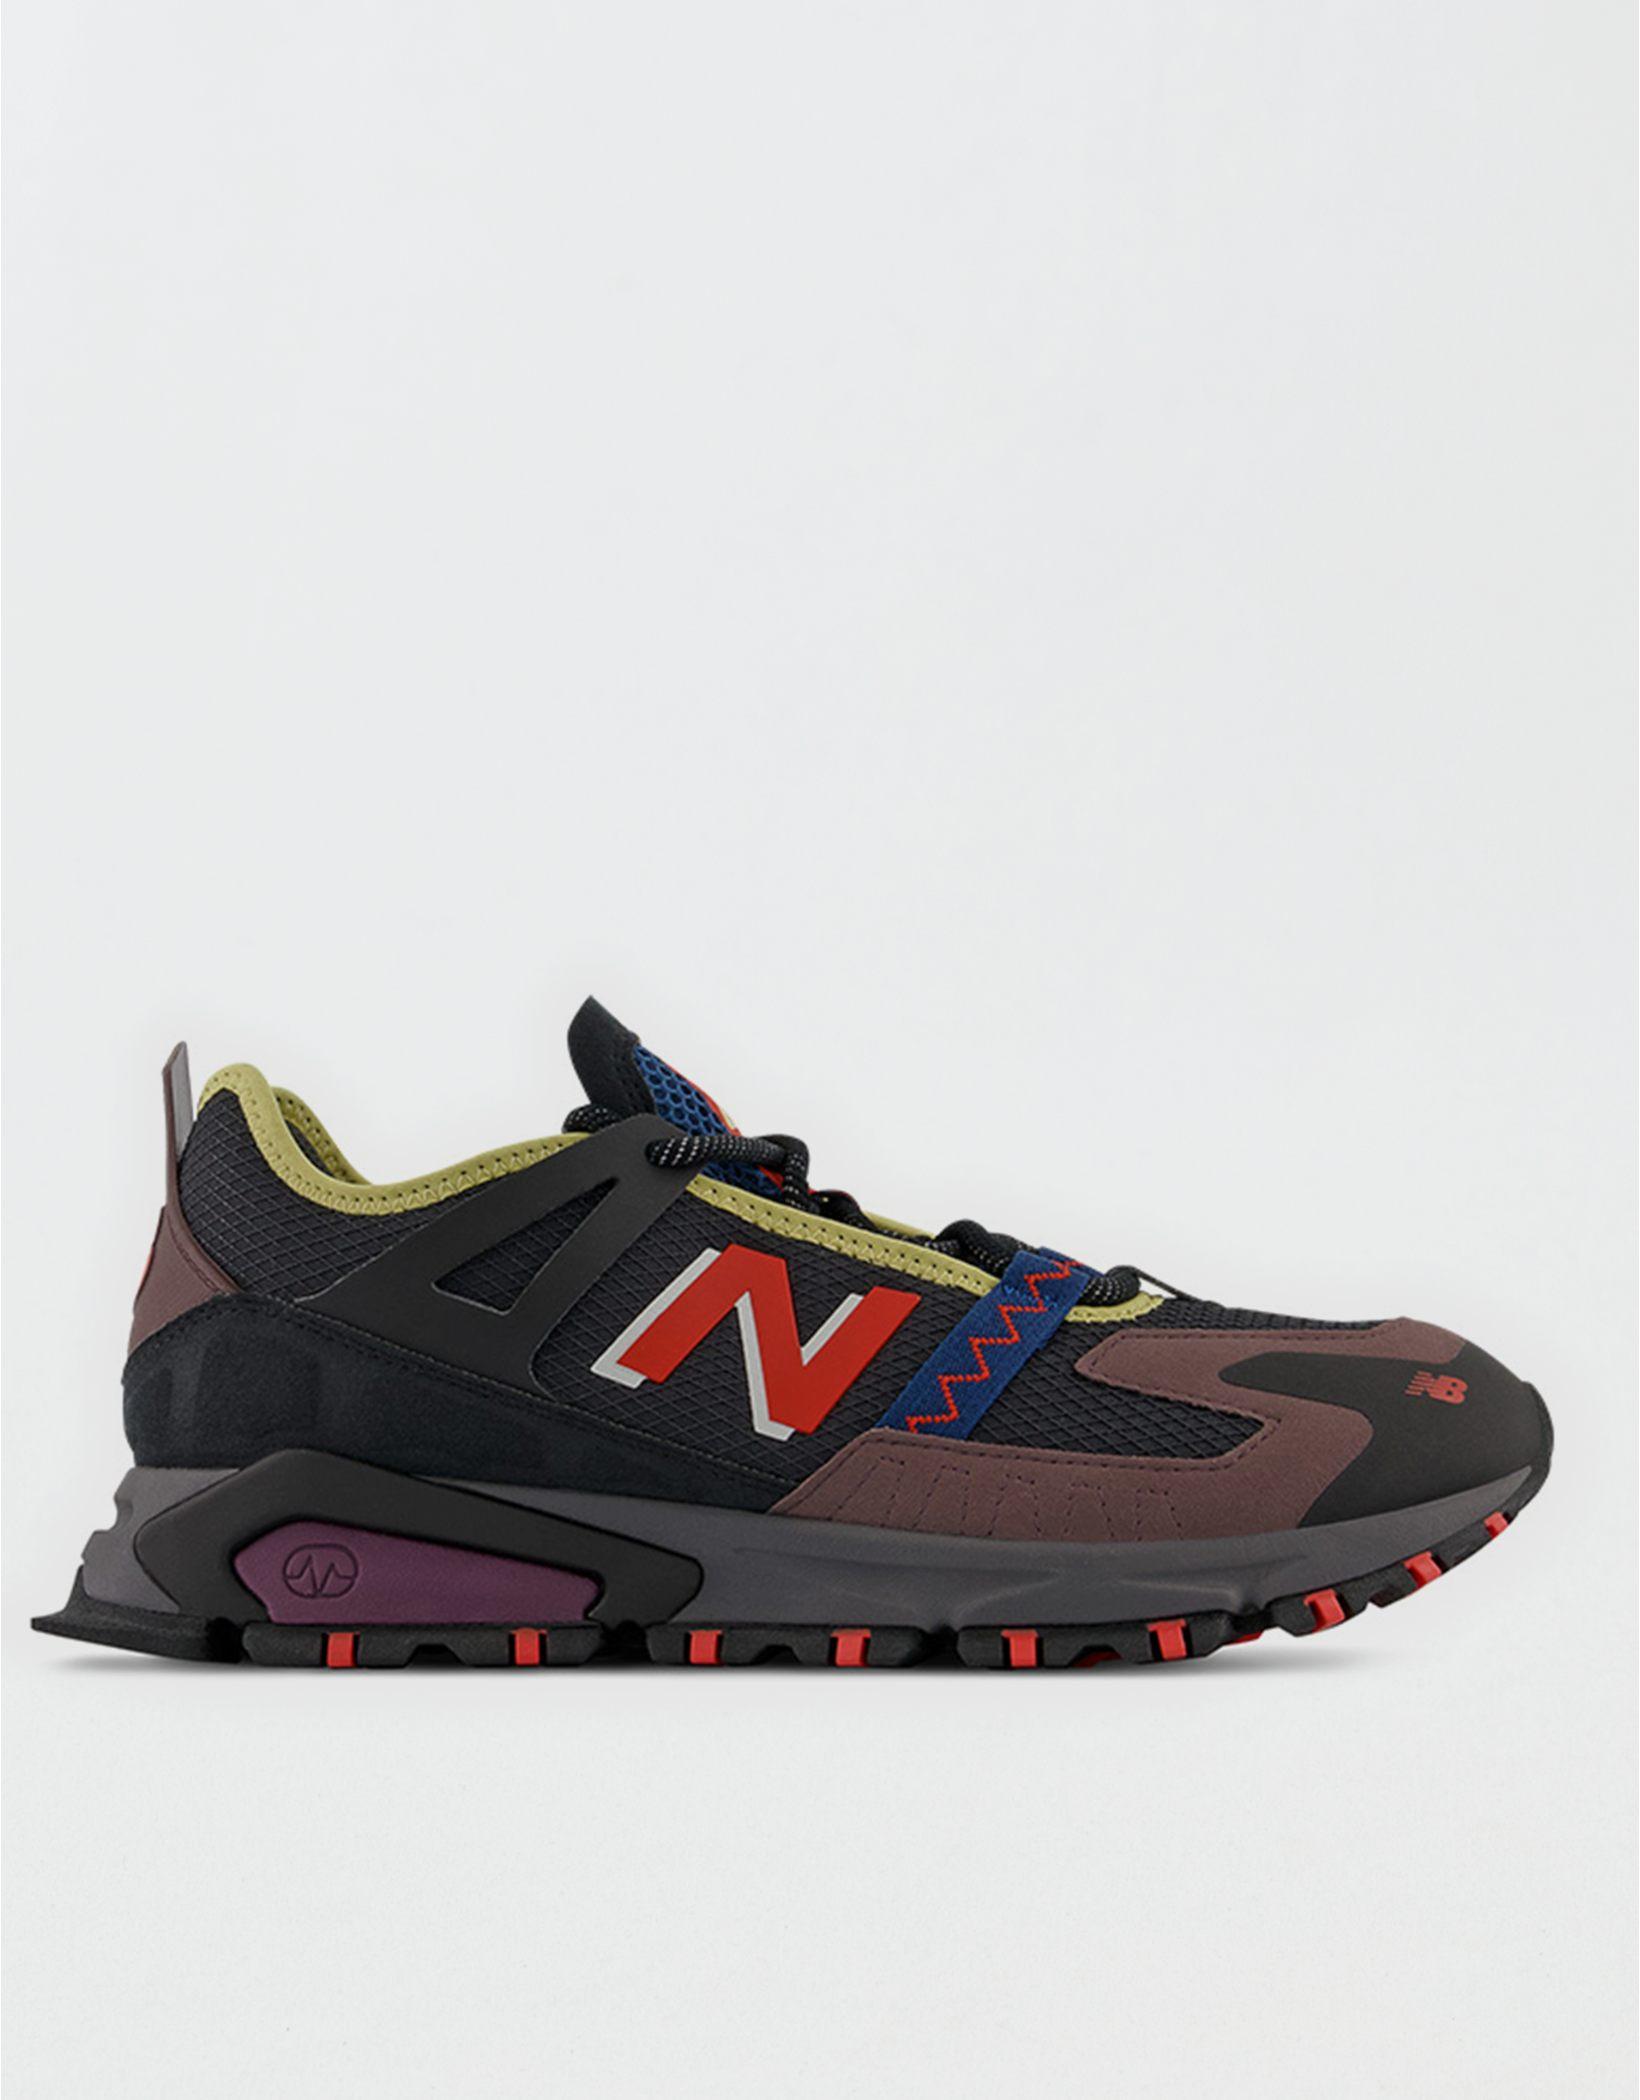 New Balance XRCT Sneaker